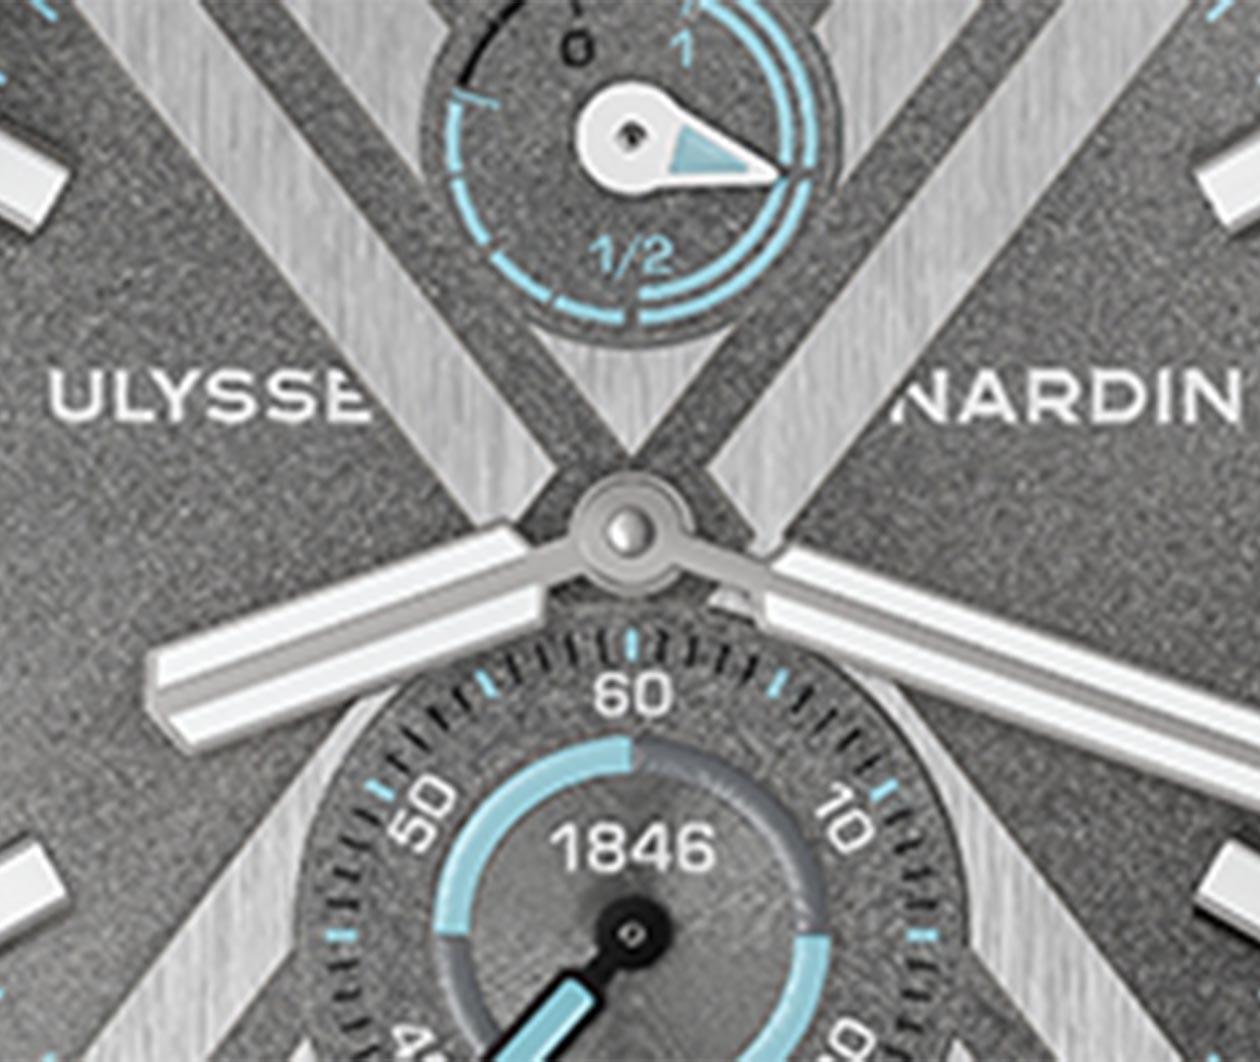 UlysseNardin Diver X42mm 1183170LE390ANT Carousel 3 FINAL